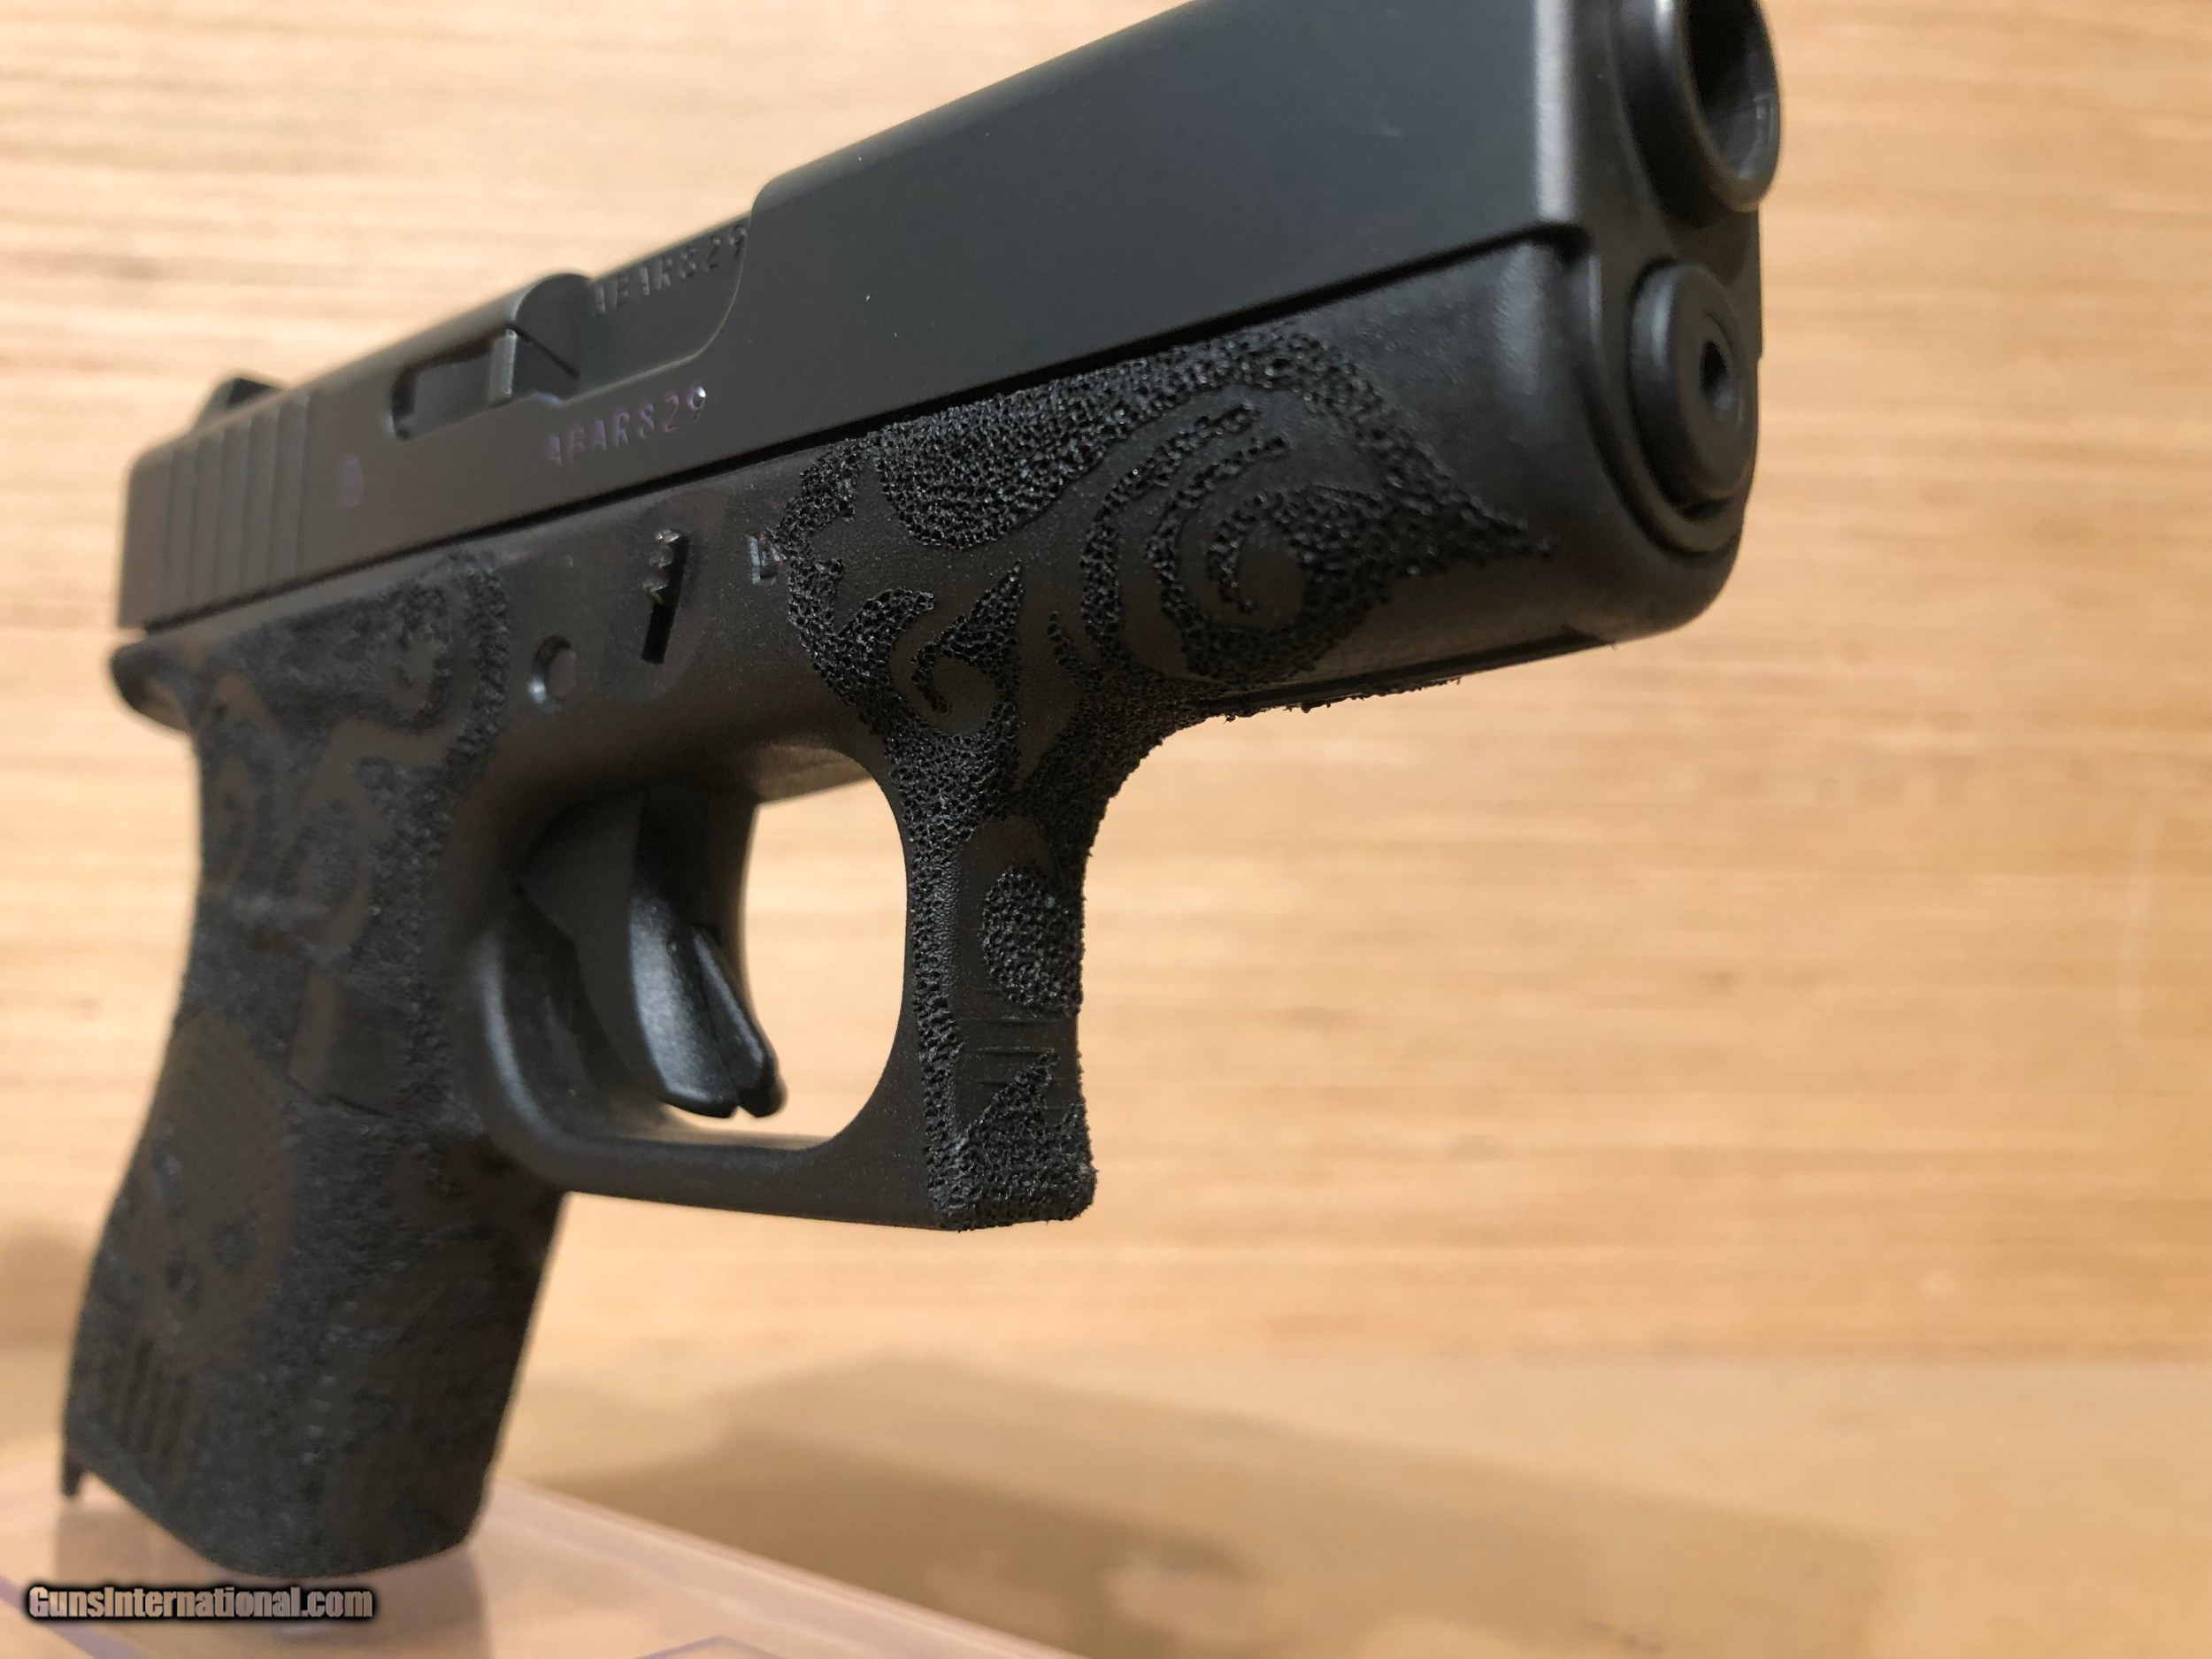 Glock 42 Slimline Subcompact Pistol UI4250201, 380 ACP